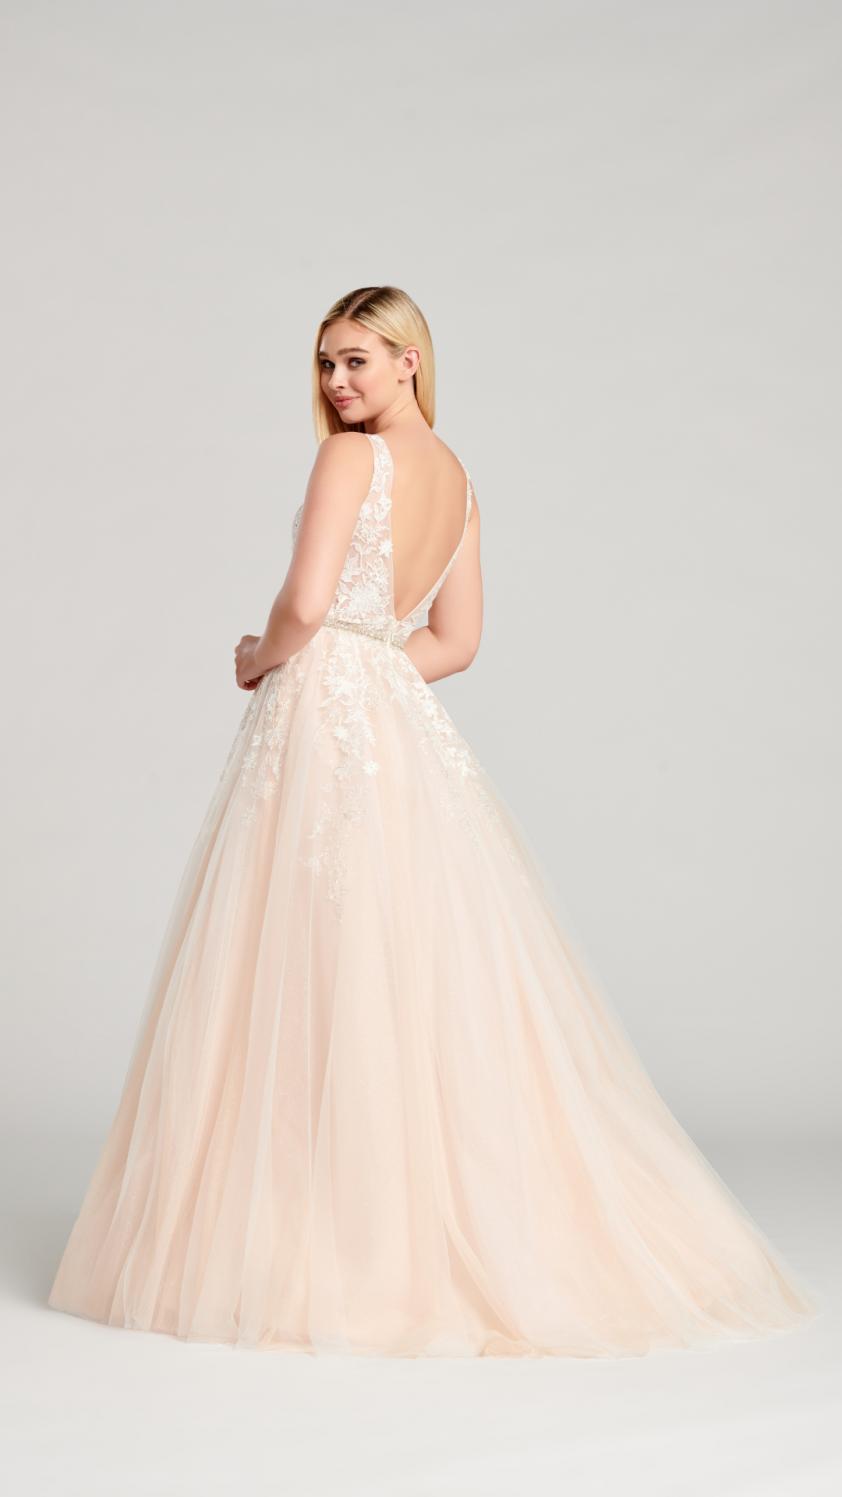 Wedding Dress MCP04022WEPROM - Dominique Levesque Bridal